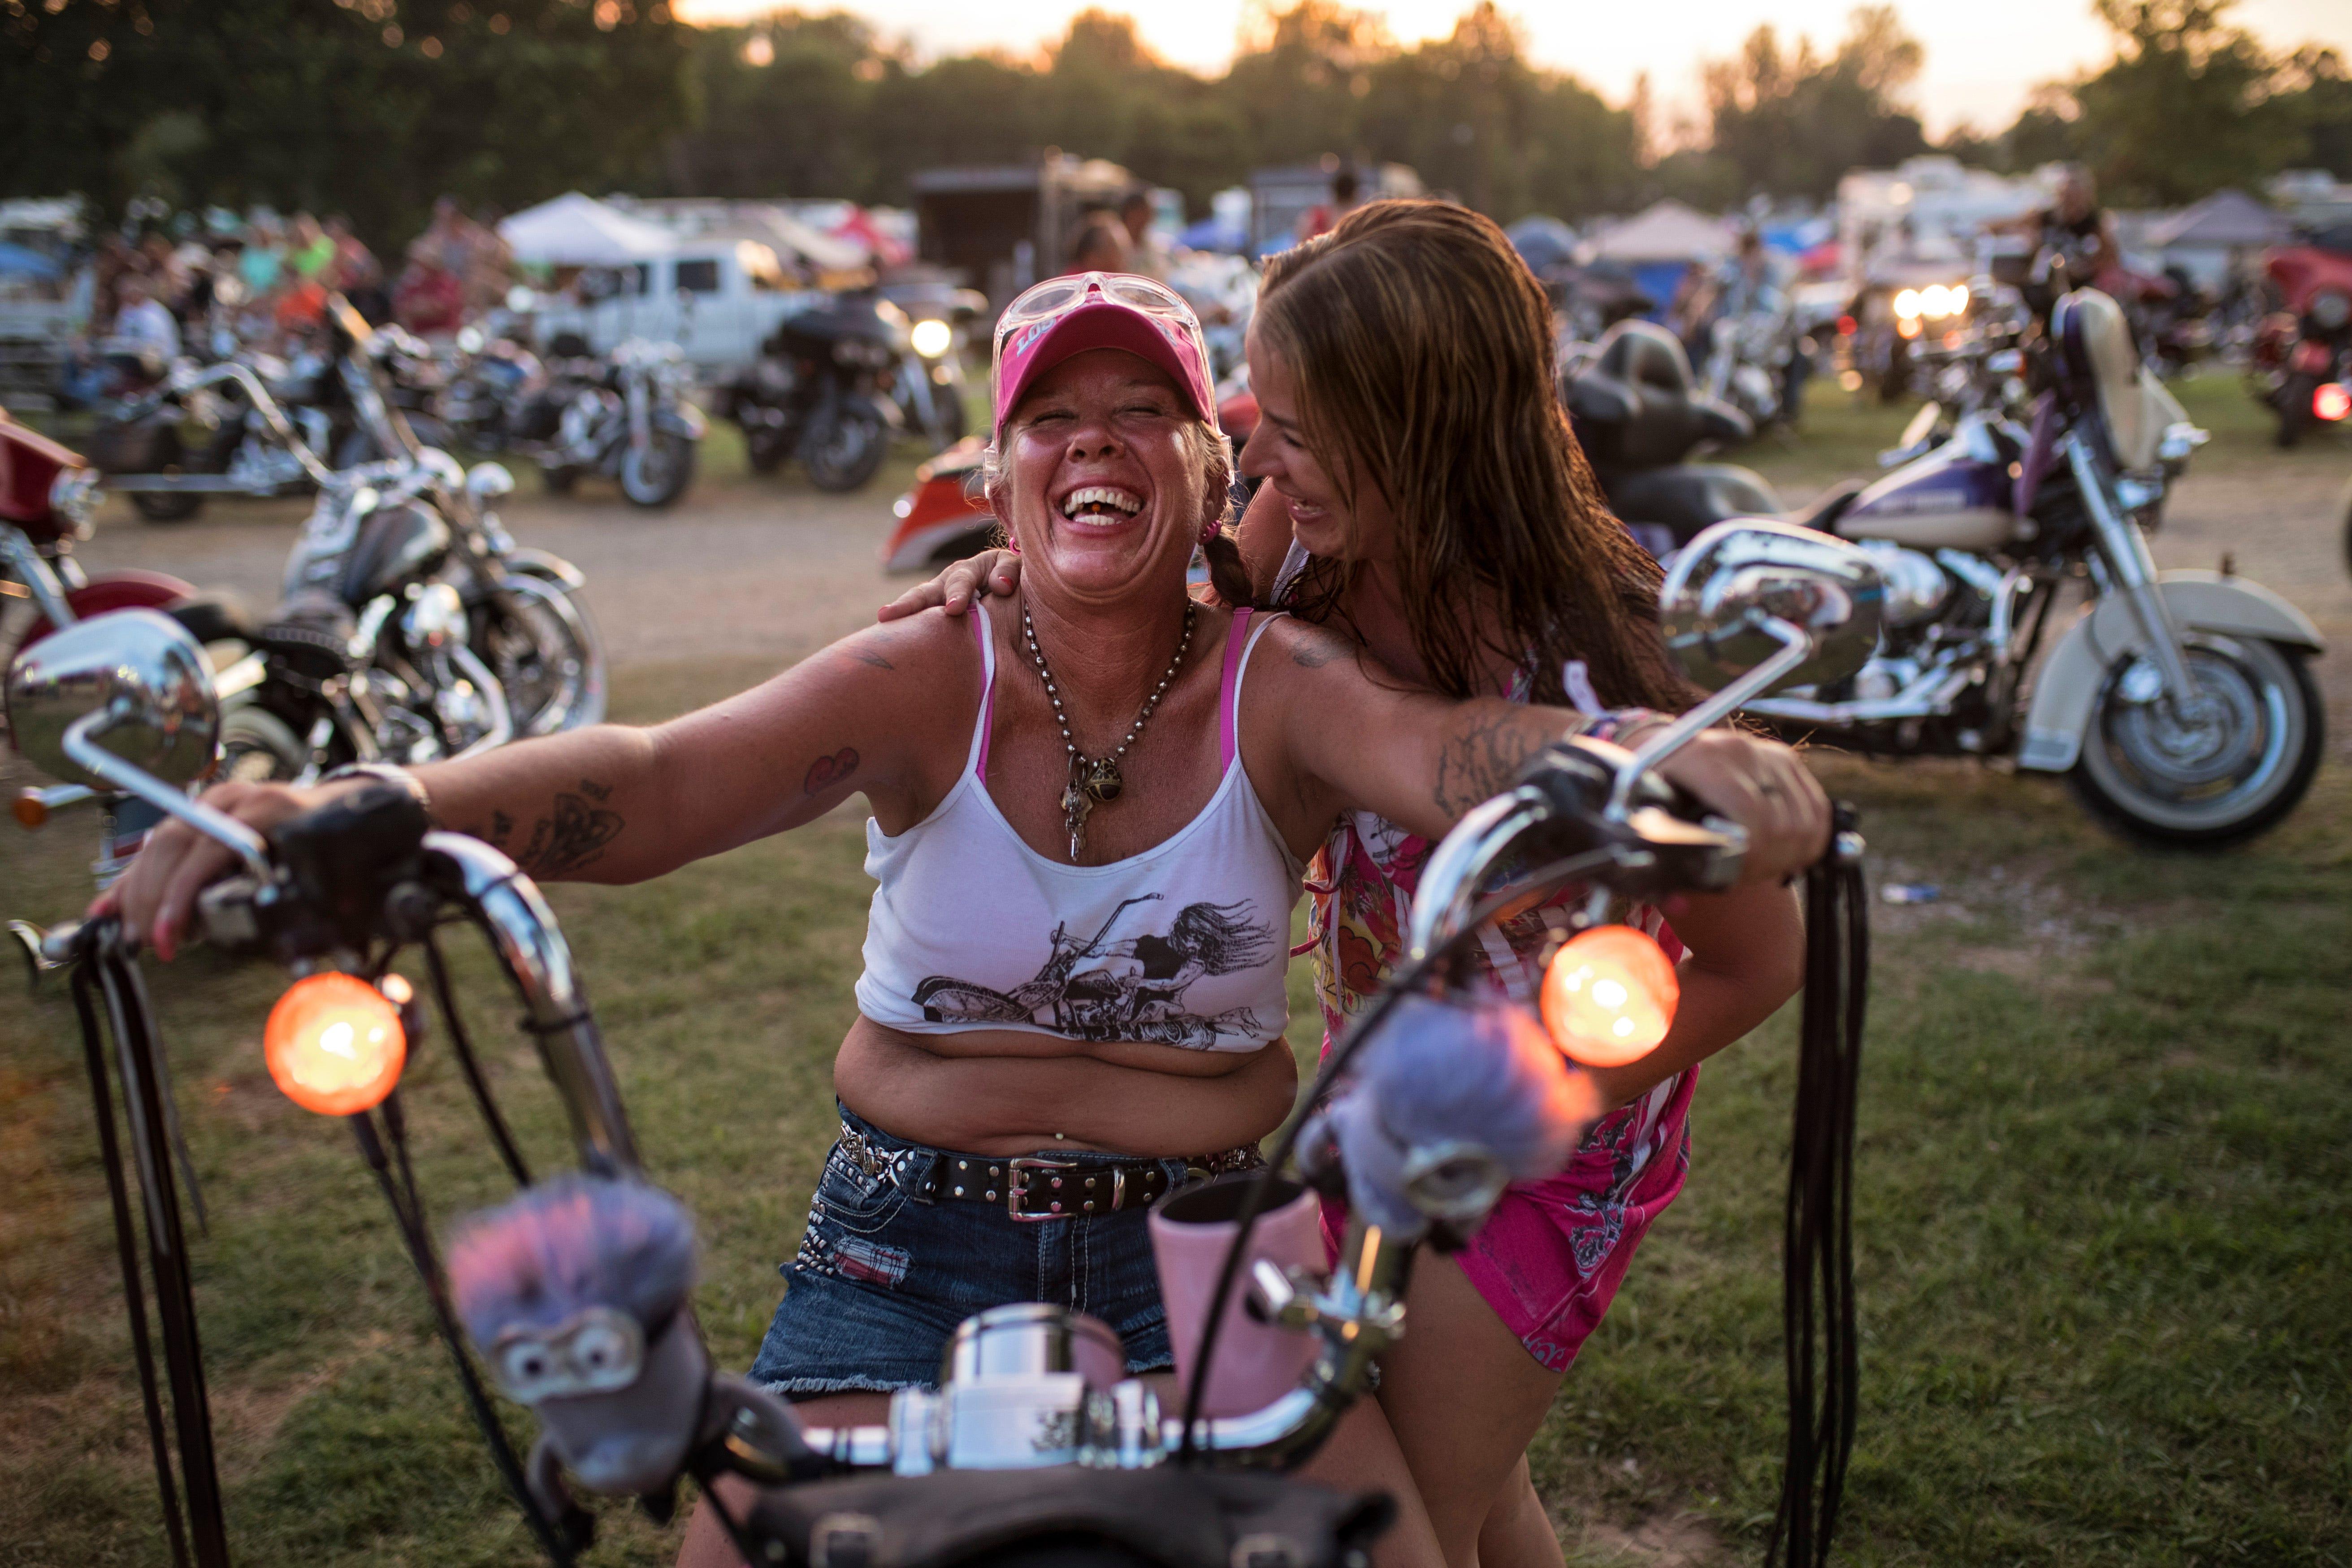 The Sturgis, Kentucky Bike Rally